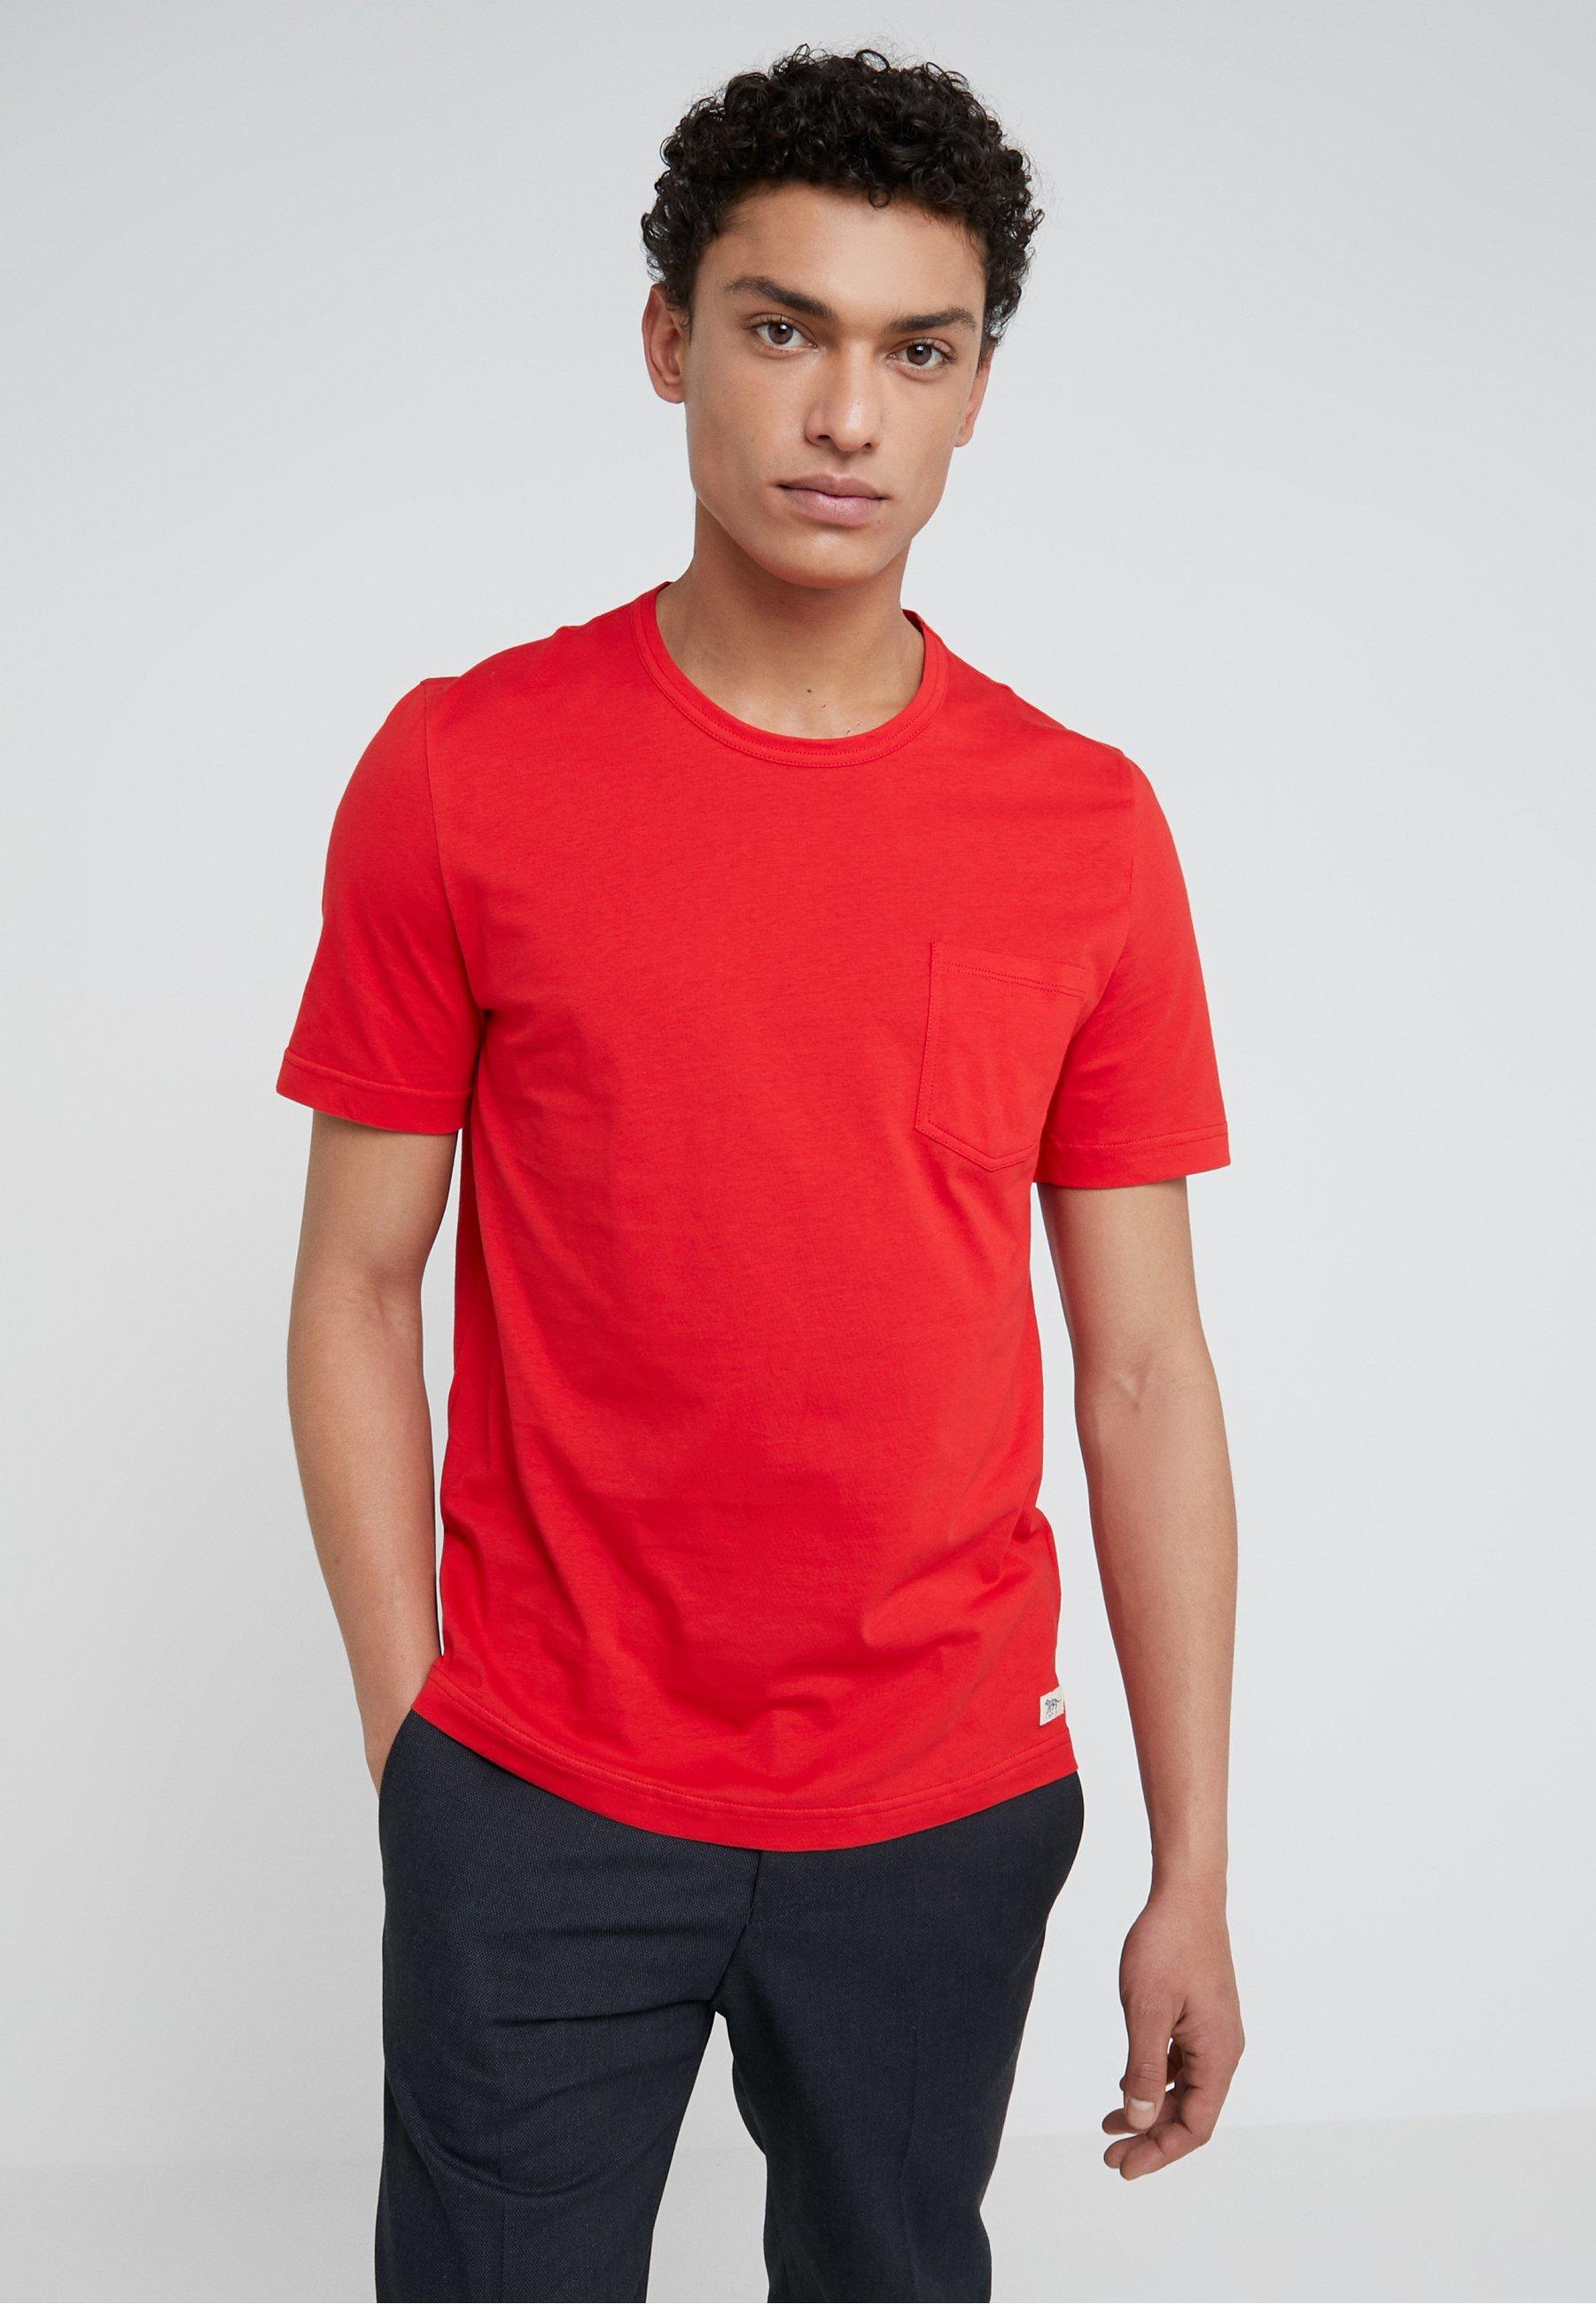 Sweden Basique Tiger shirt DidelotT Of Tulip HEY2WD9eI